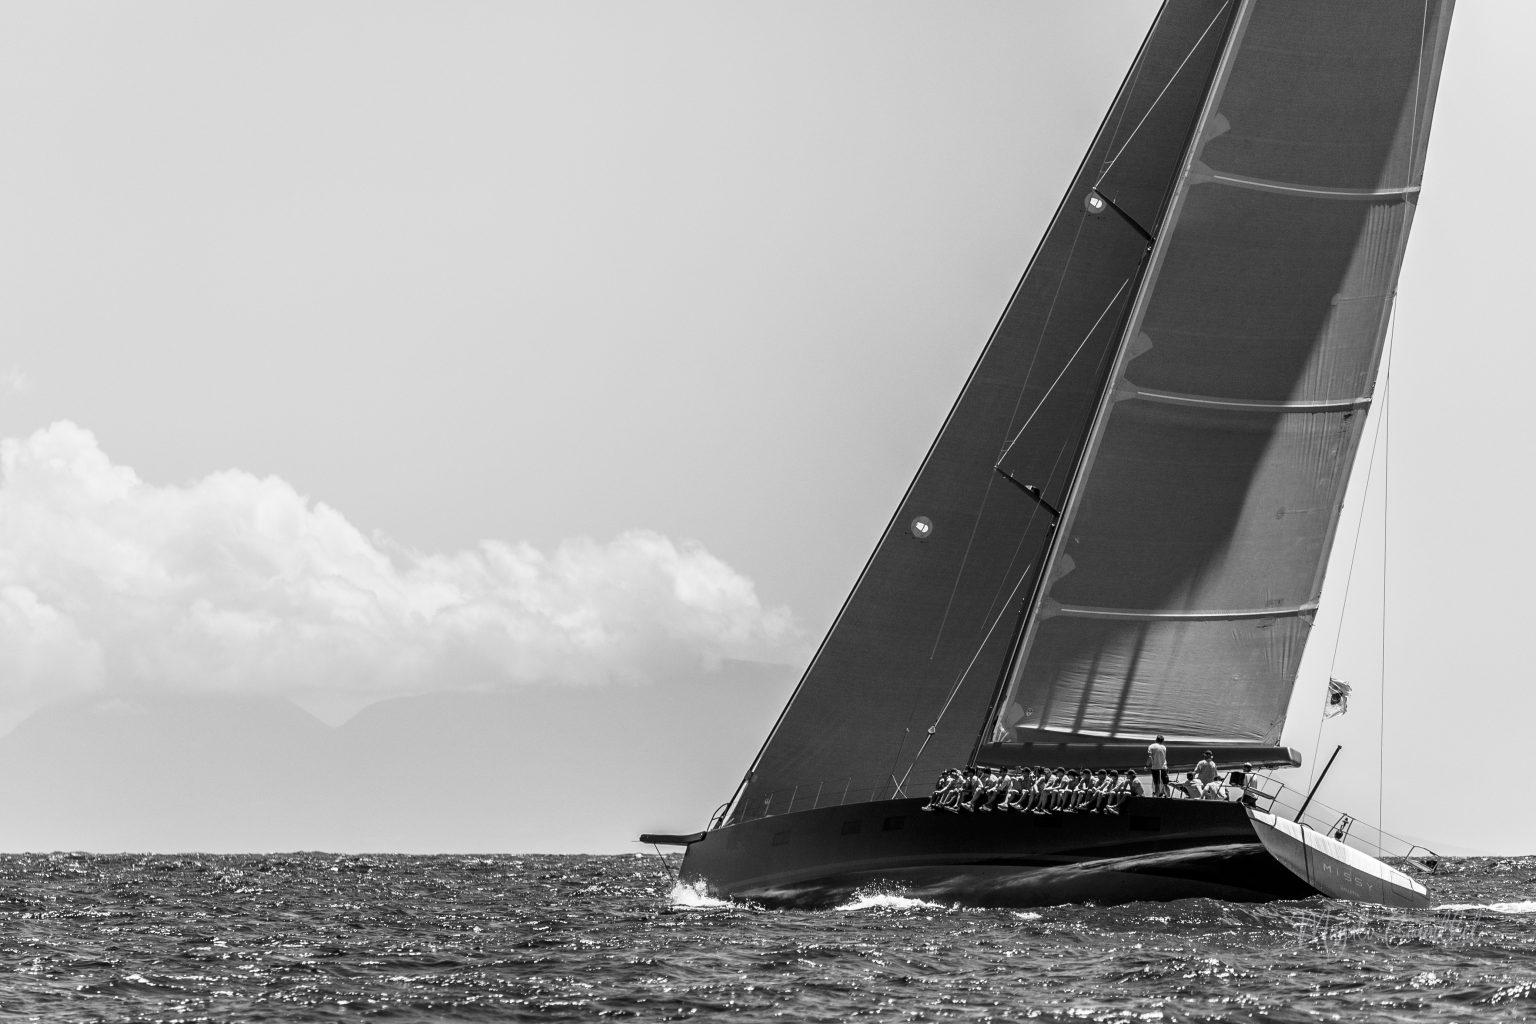 Missy Yacht, Bucket Regatta 2019 St Barths